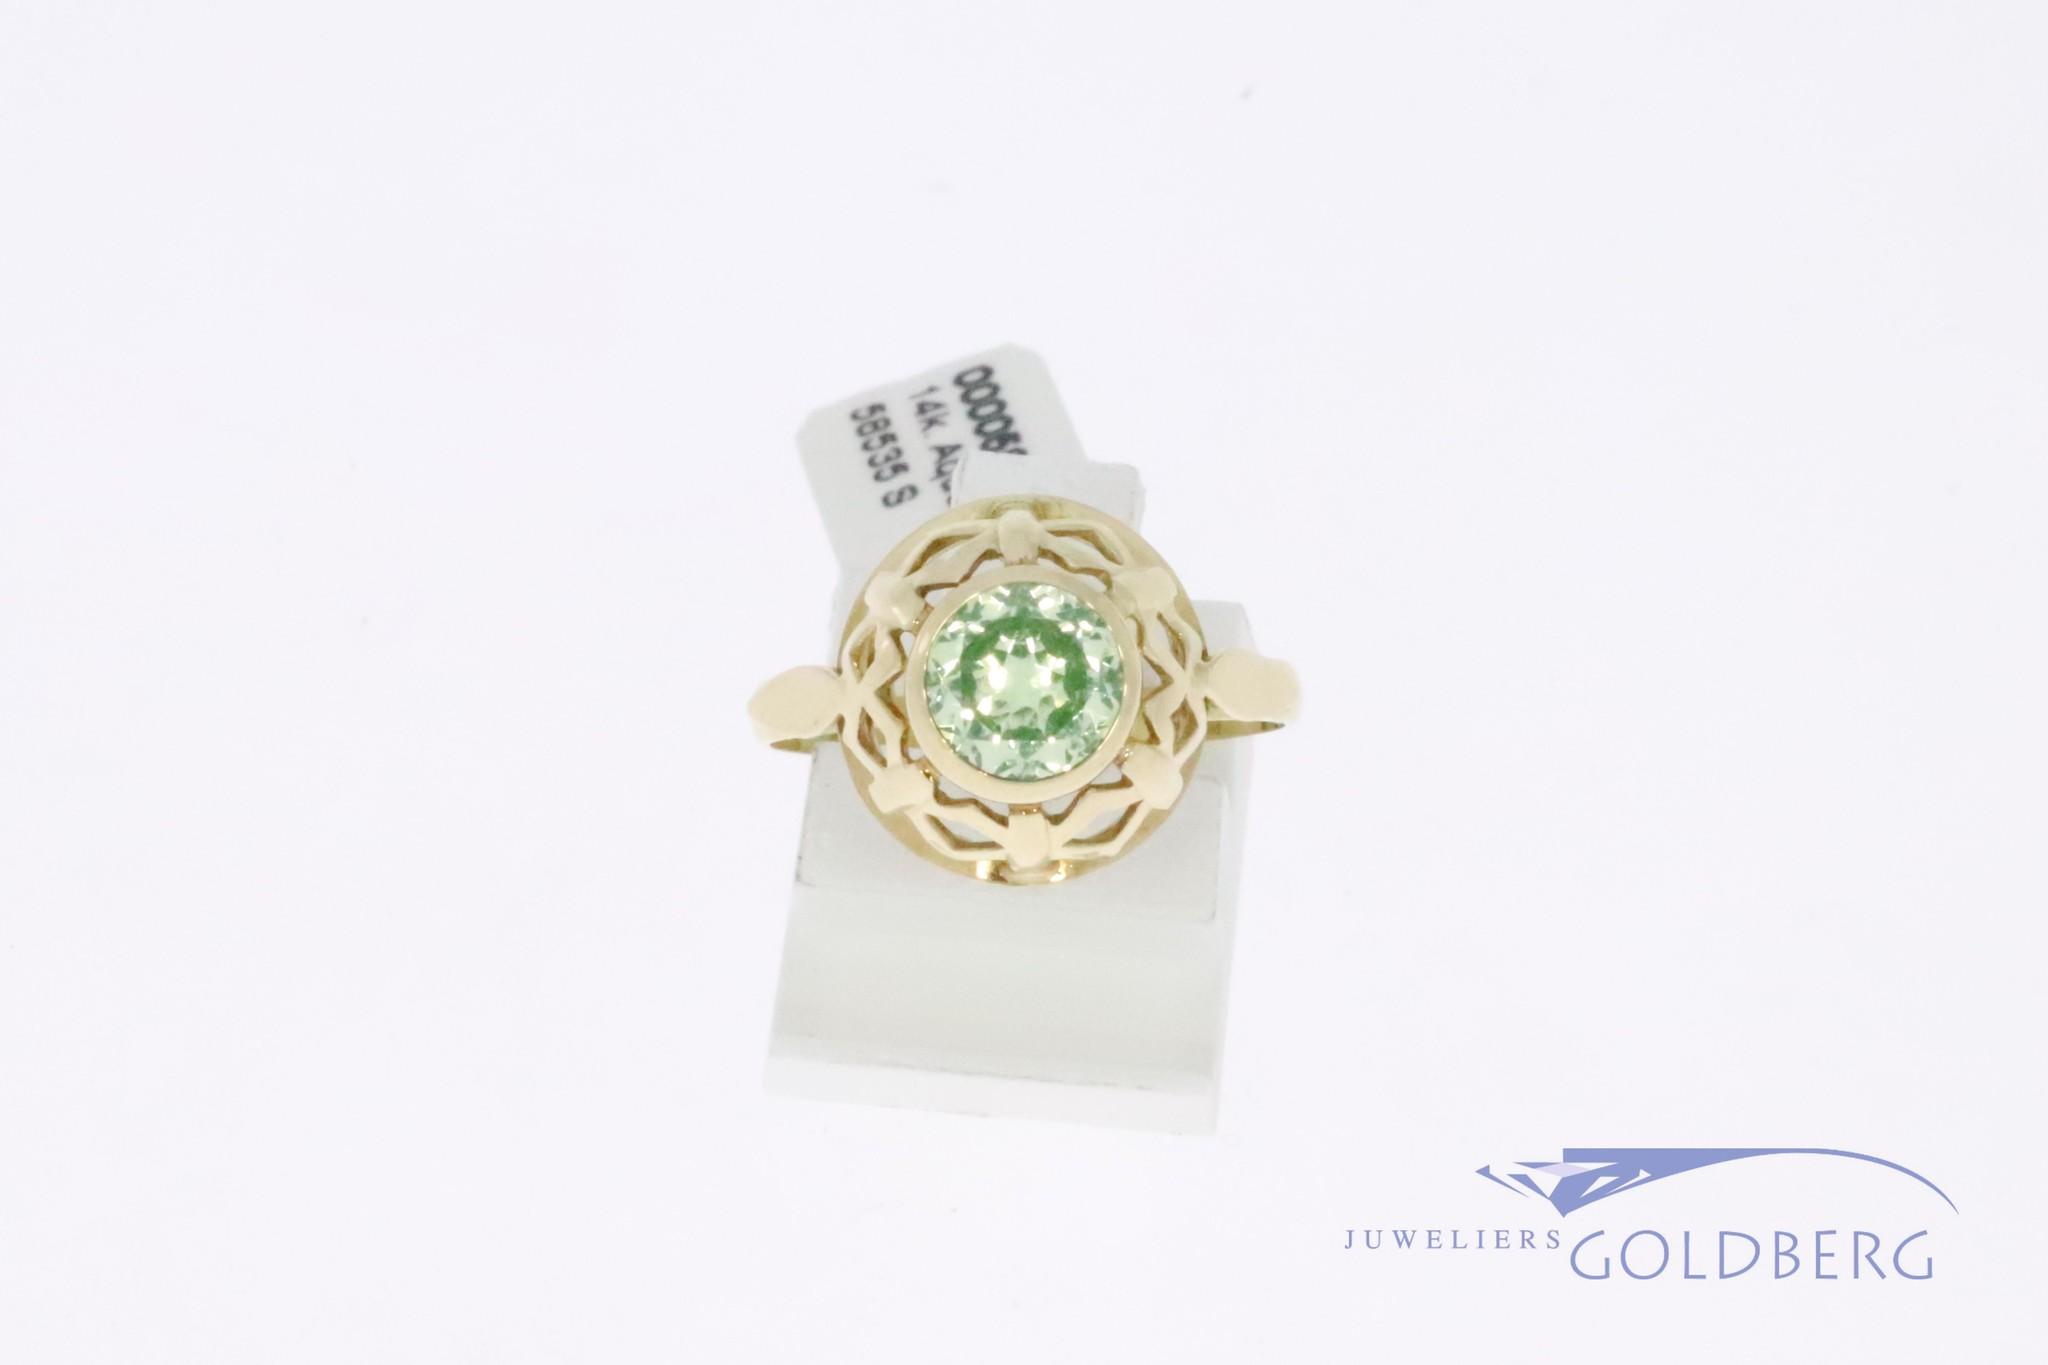 14k gouden vintage ring met ronde citrien